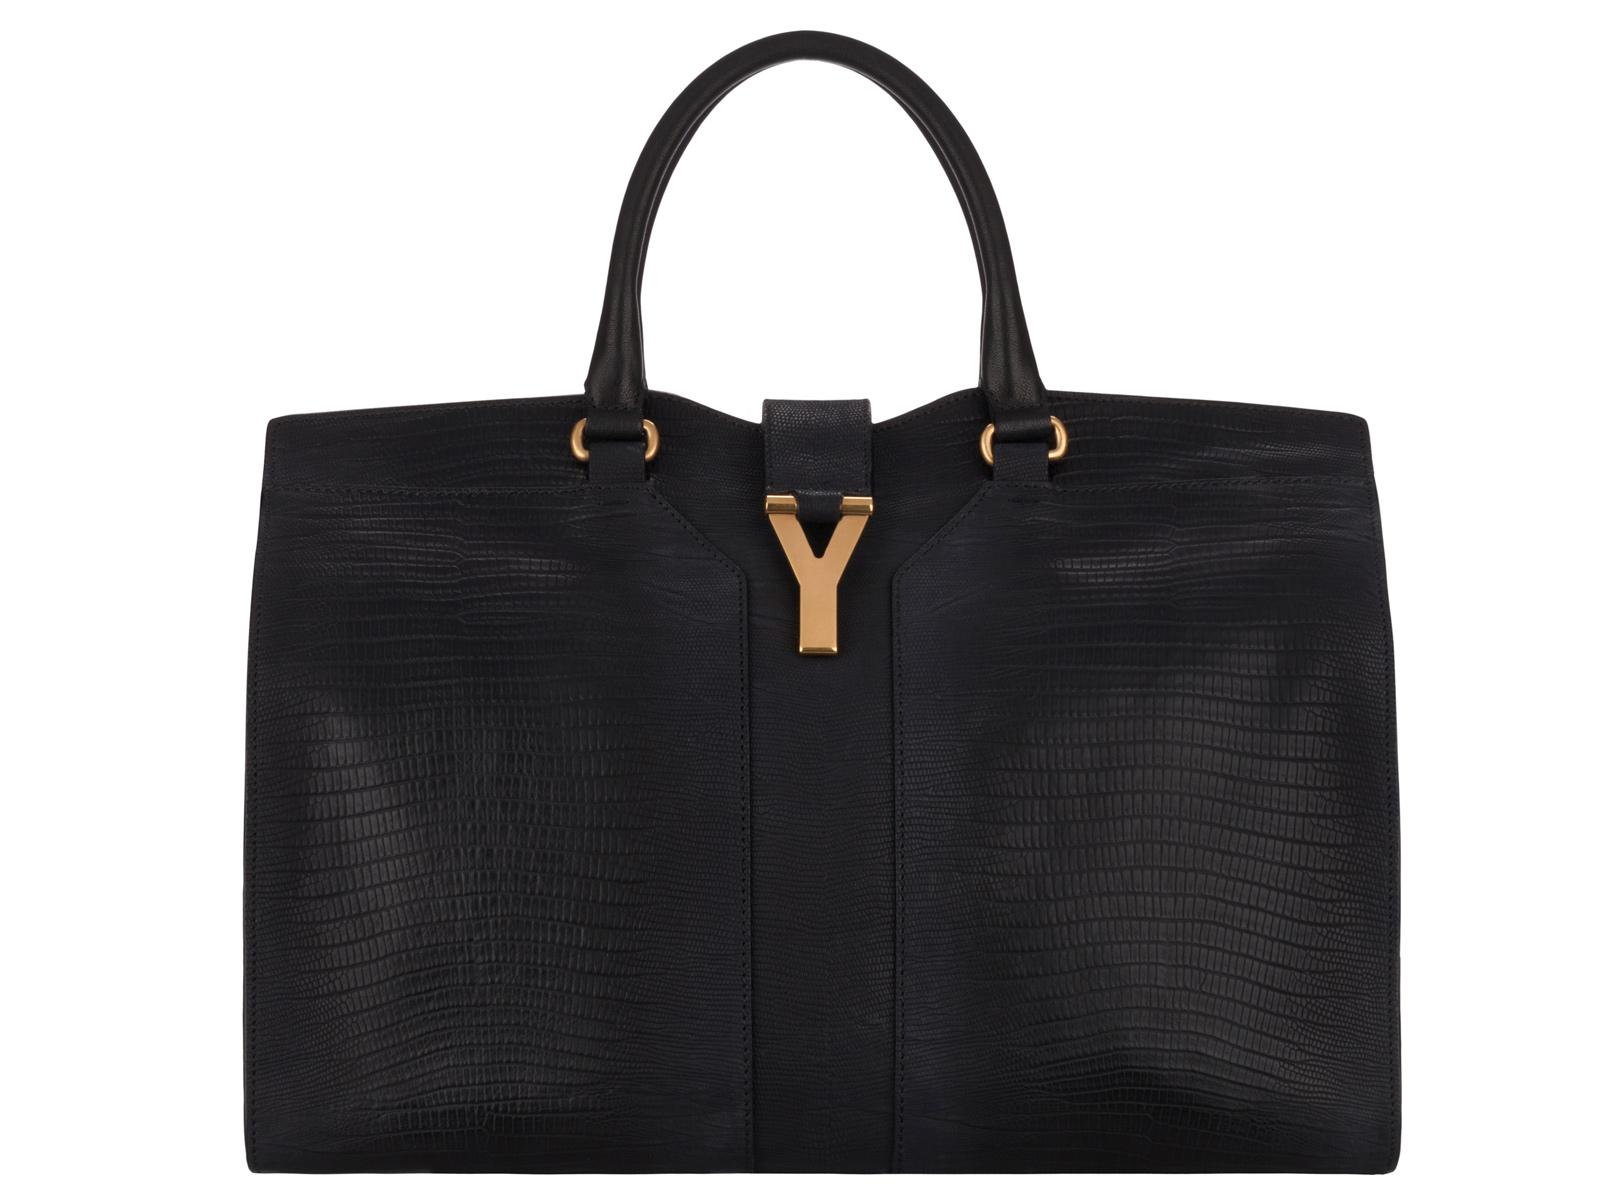 Сумка, Yves Saint Laurent Третьяковский пр-д., 11,  тел. (495) 933 3395 цена 104 500 руб.